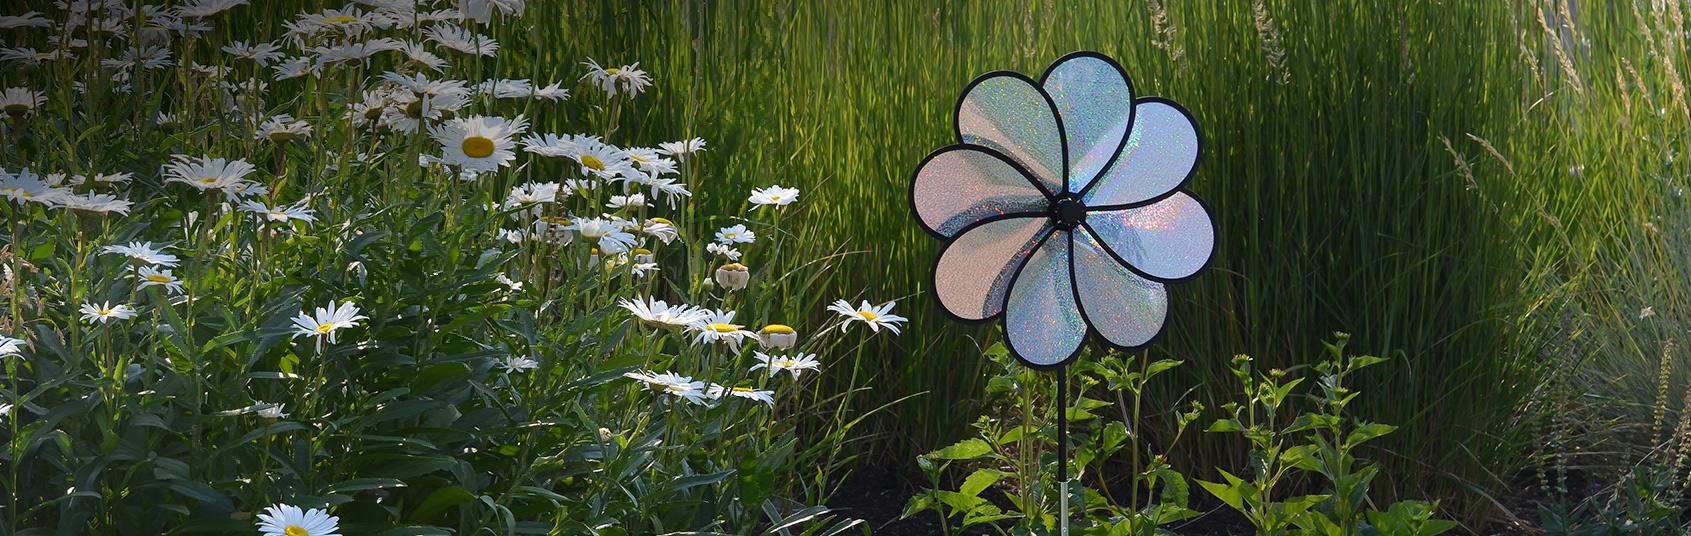 Wind Spinners | Outdoor Pinwheels | Wind Spinners